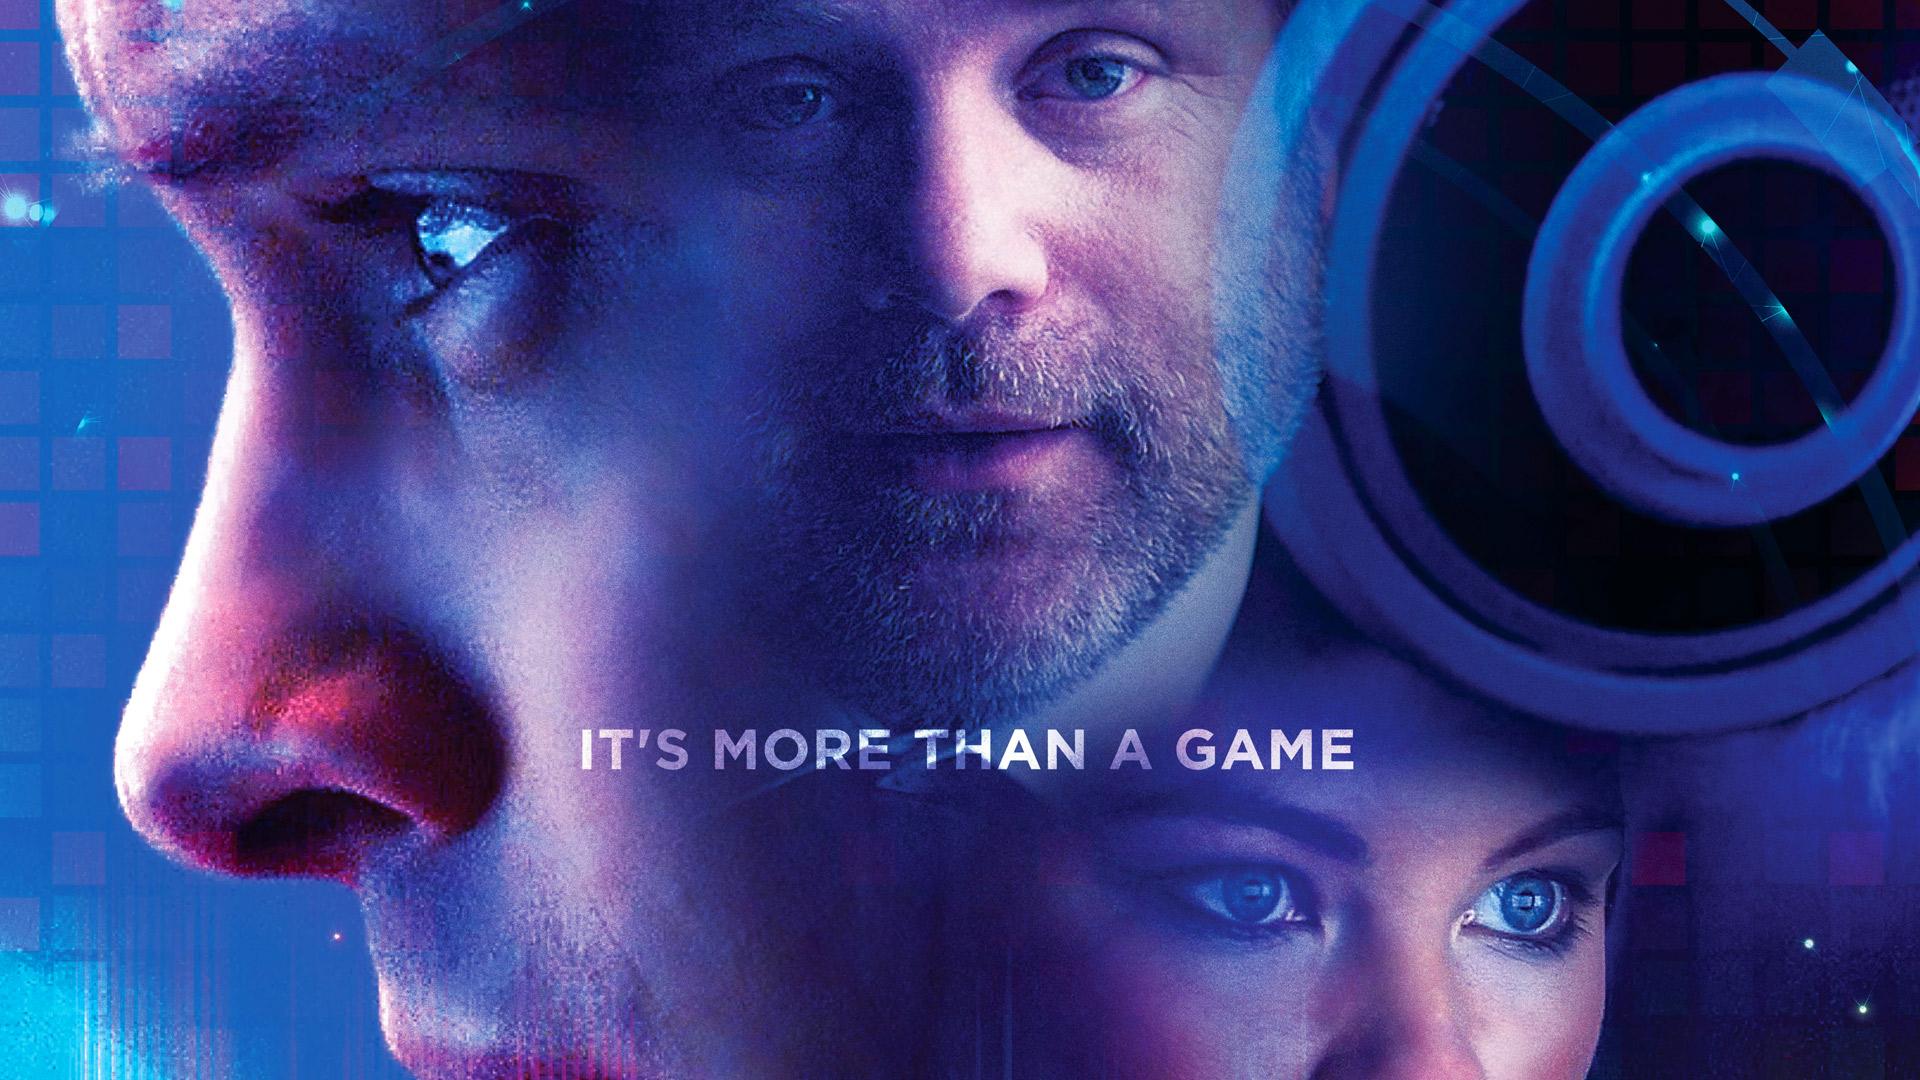 Director Joseph Procopio Talks eHero and Competitive Gaming